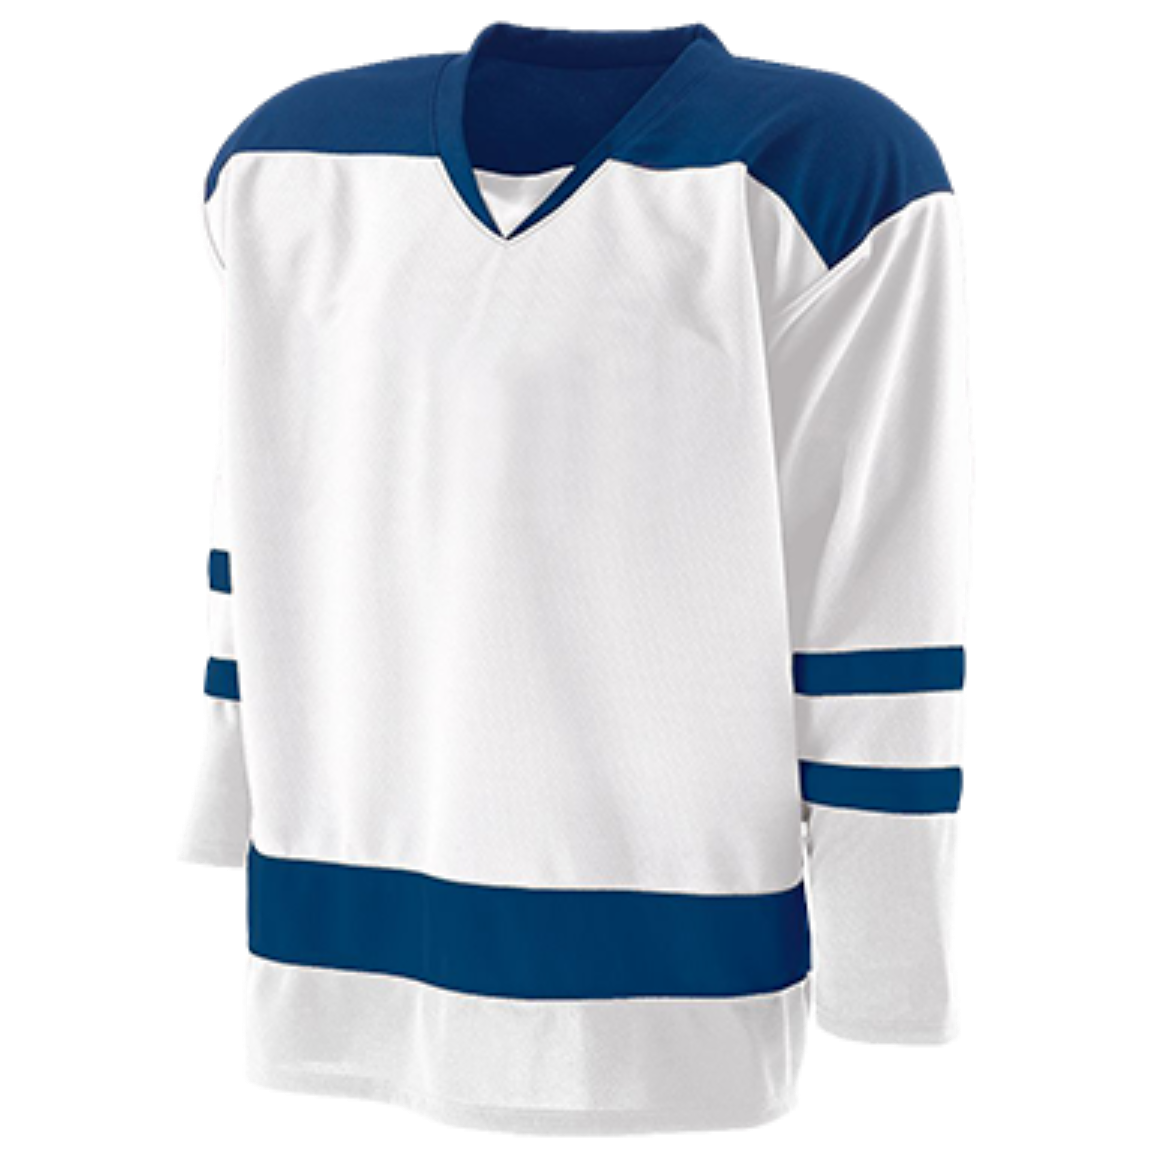 Youth Hockey Goalie Jersey